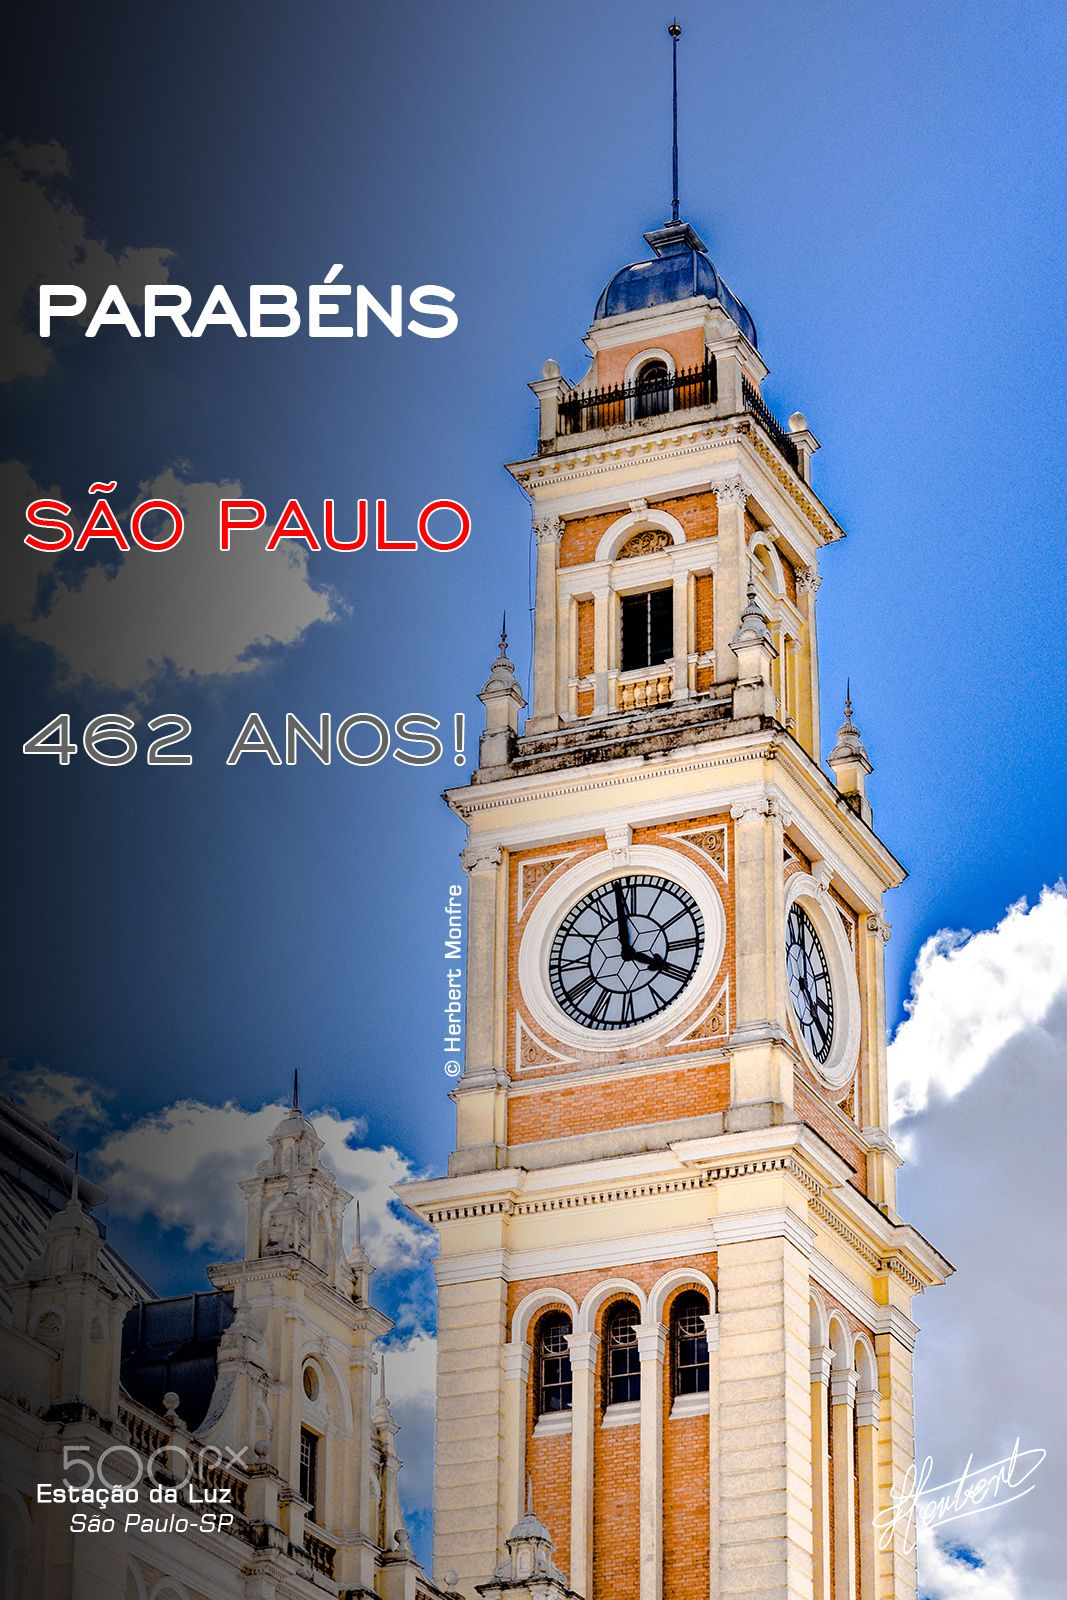 Parabéns SÃO PAULO | 462 anos